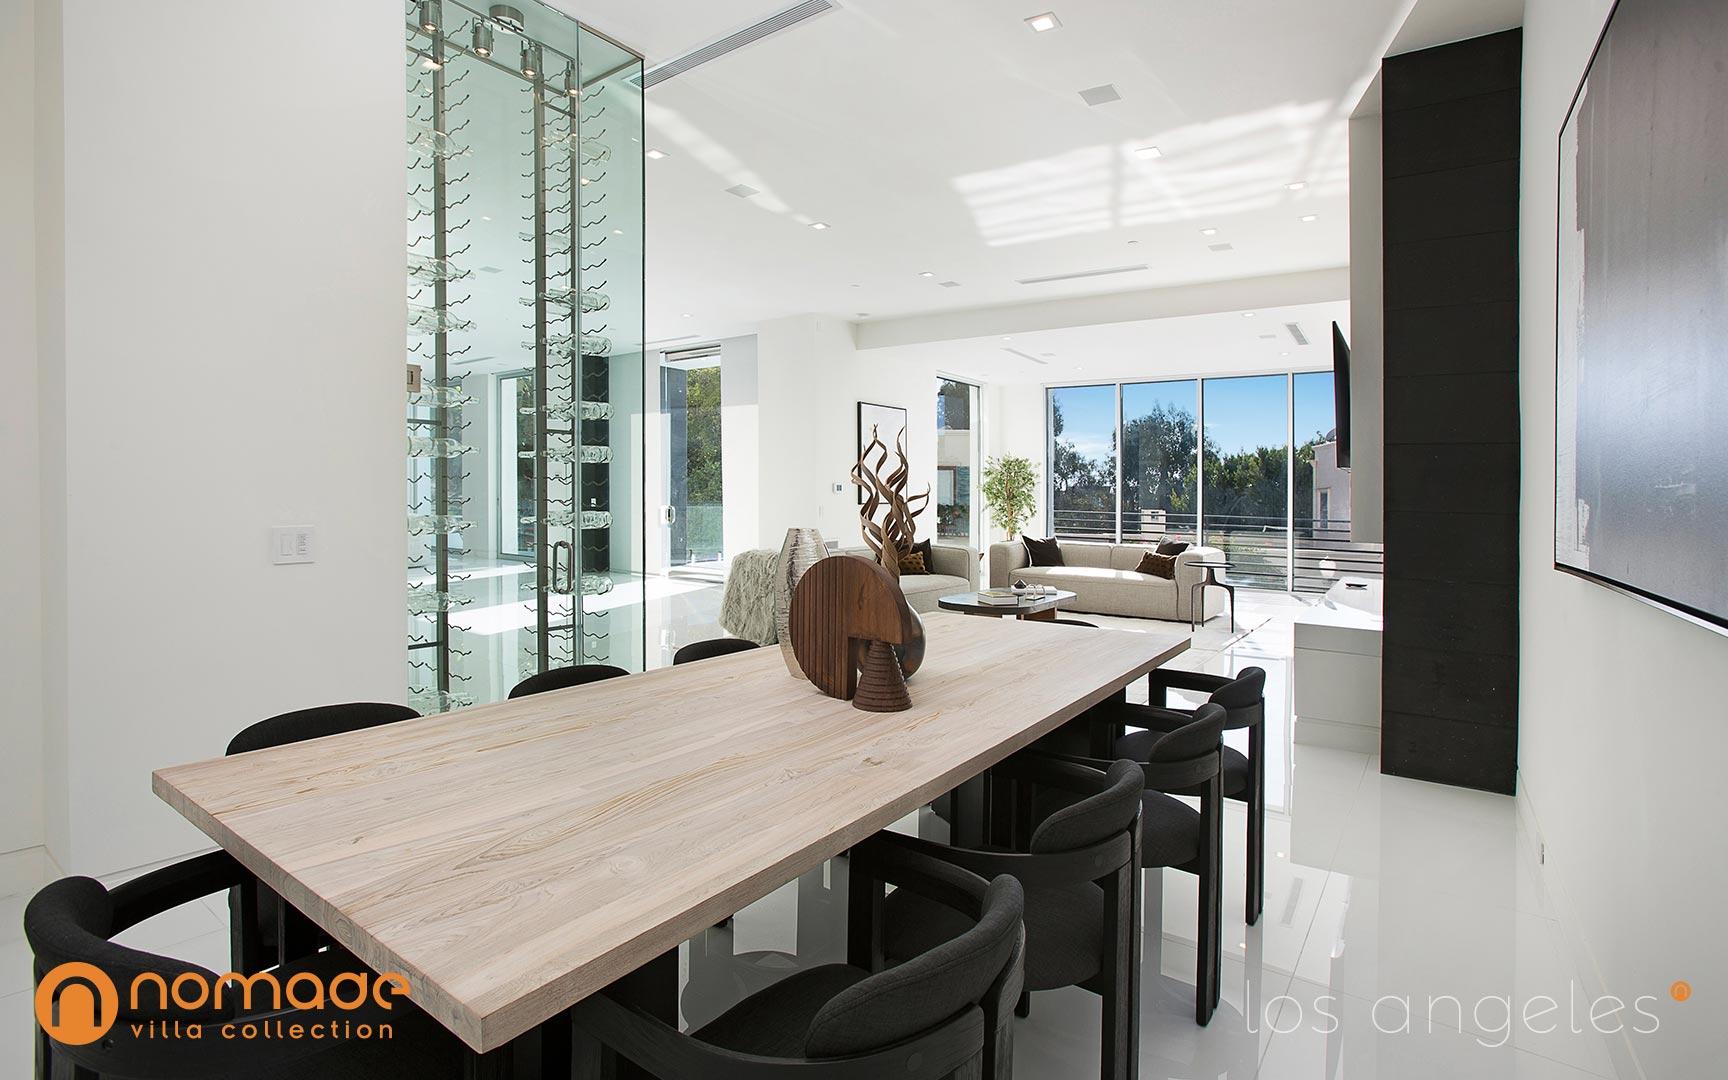 nomade-losangeles-BeverlyCrest-023